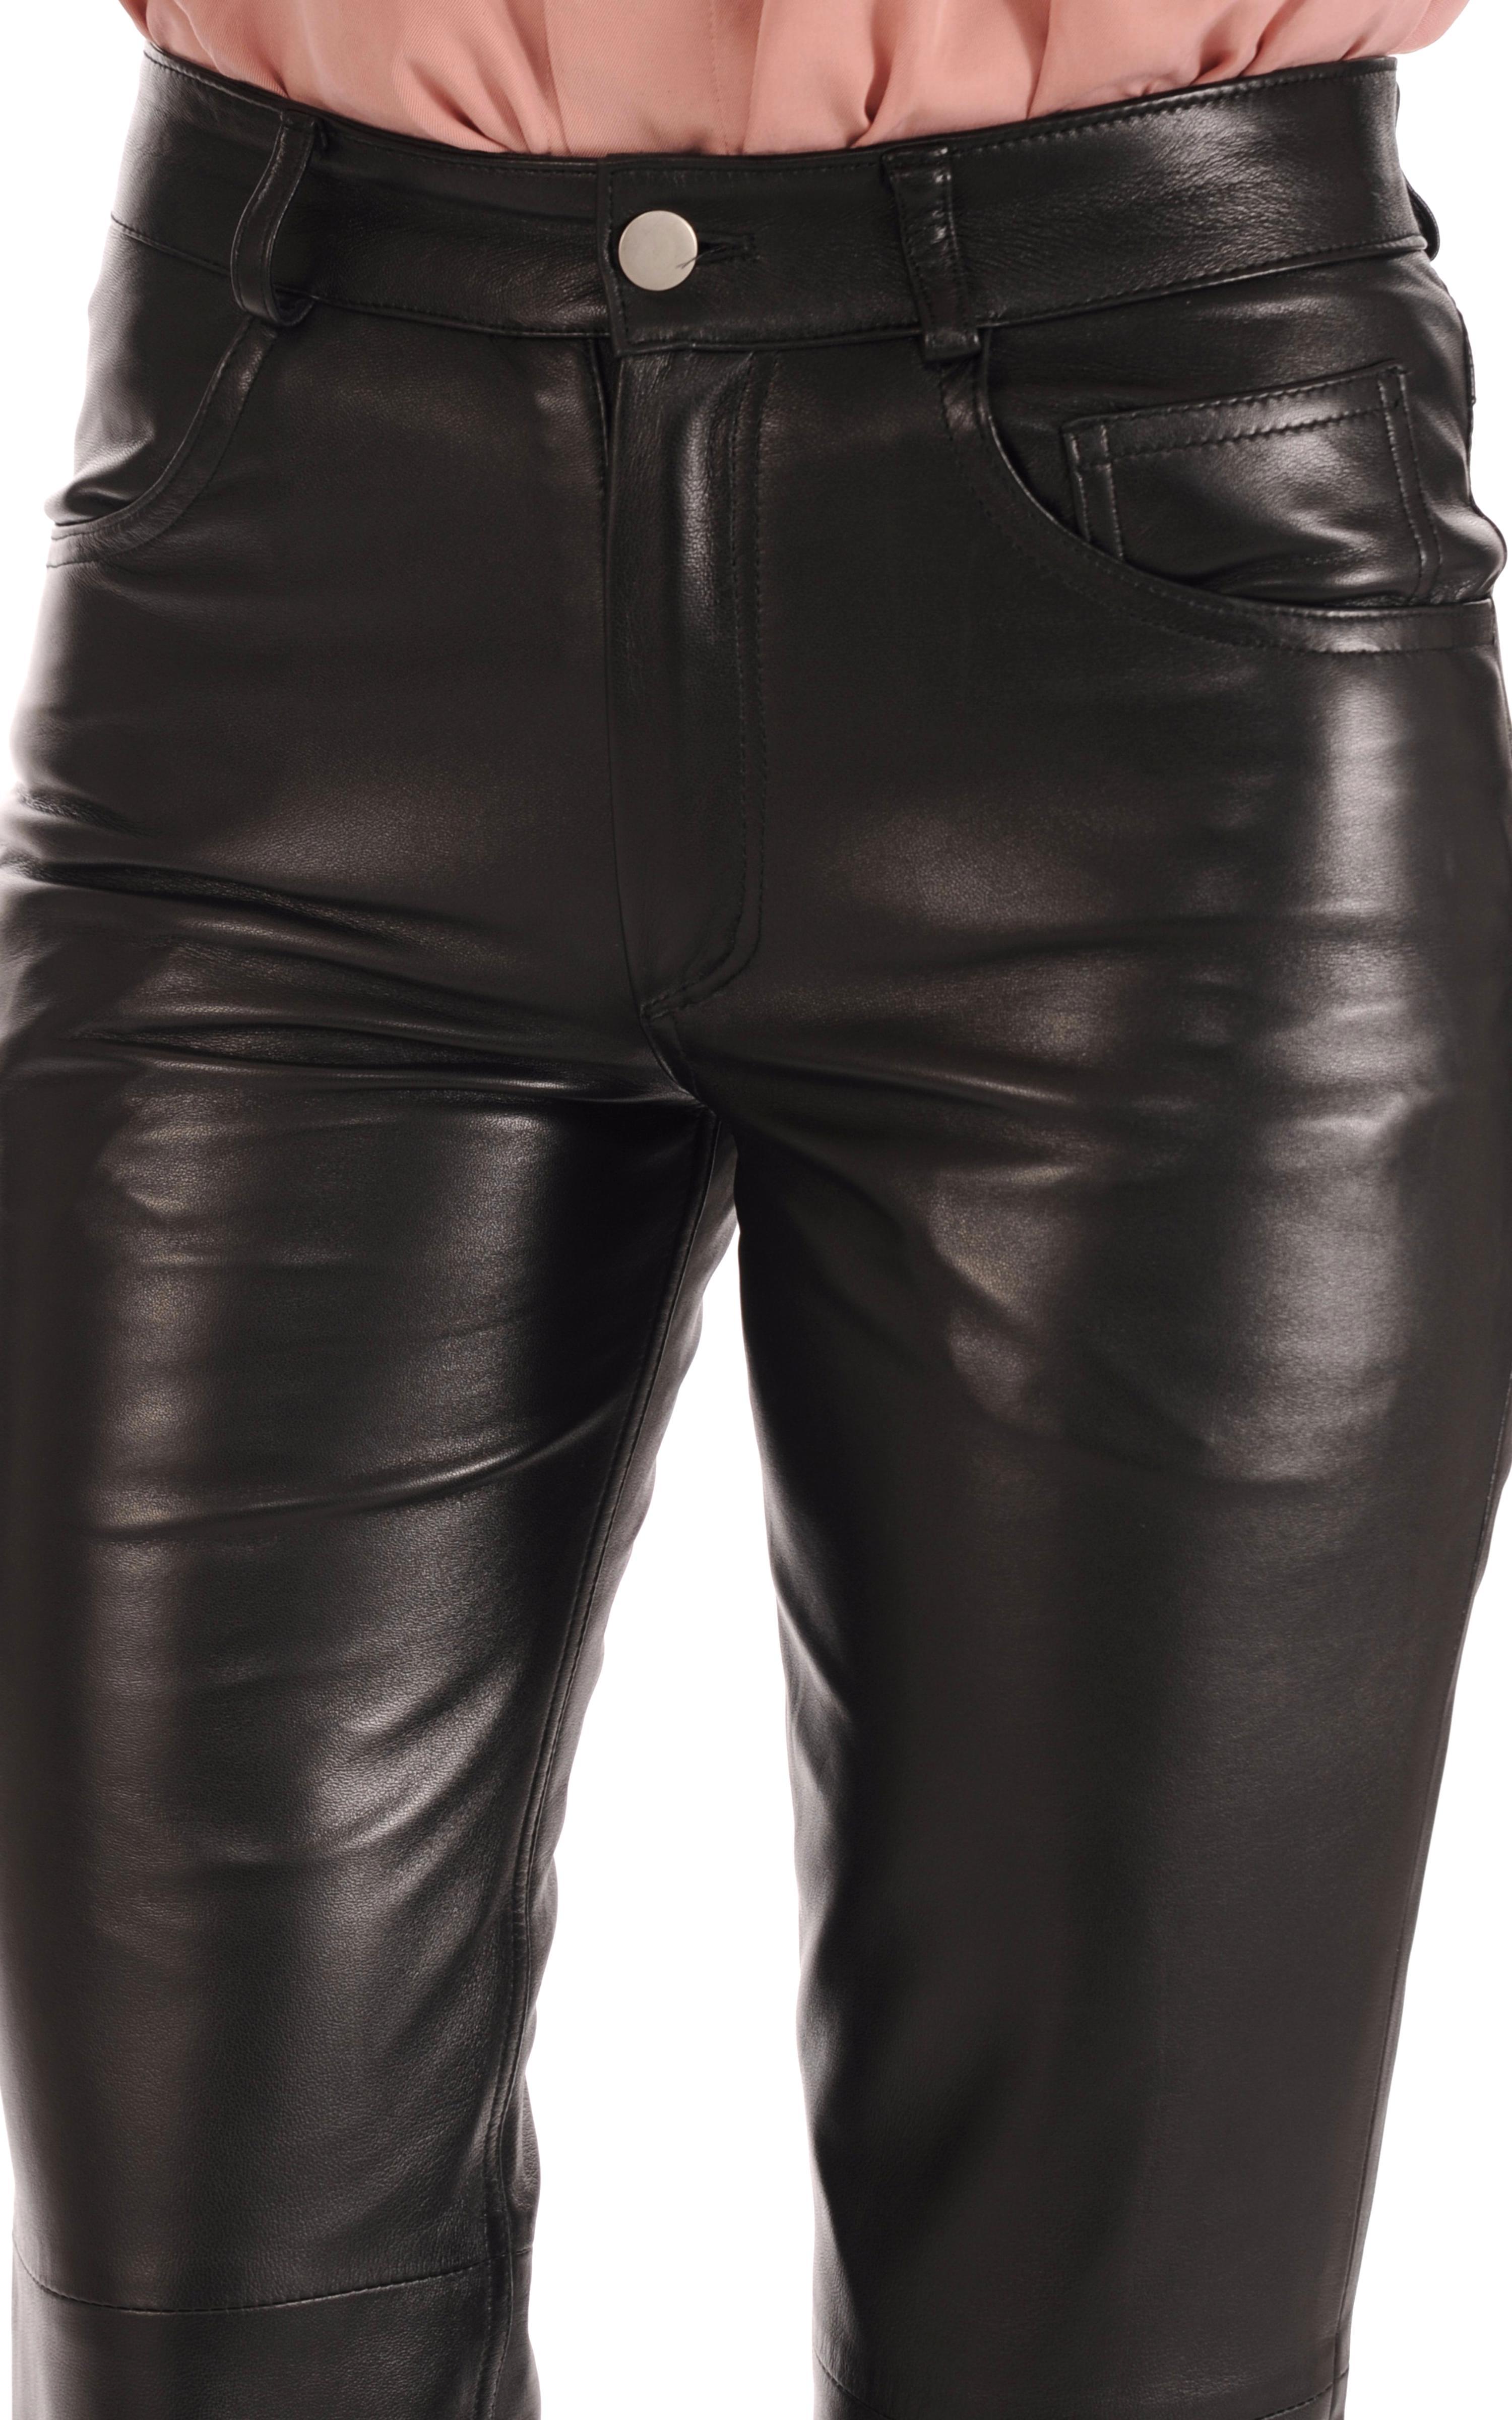 en soldes db93a e5ff5 pantalon cuir 501